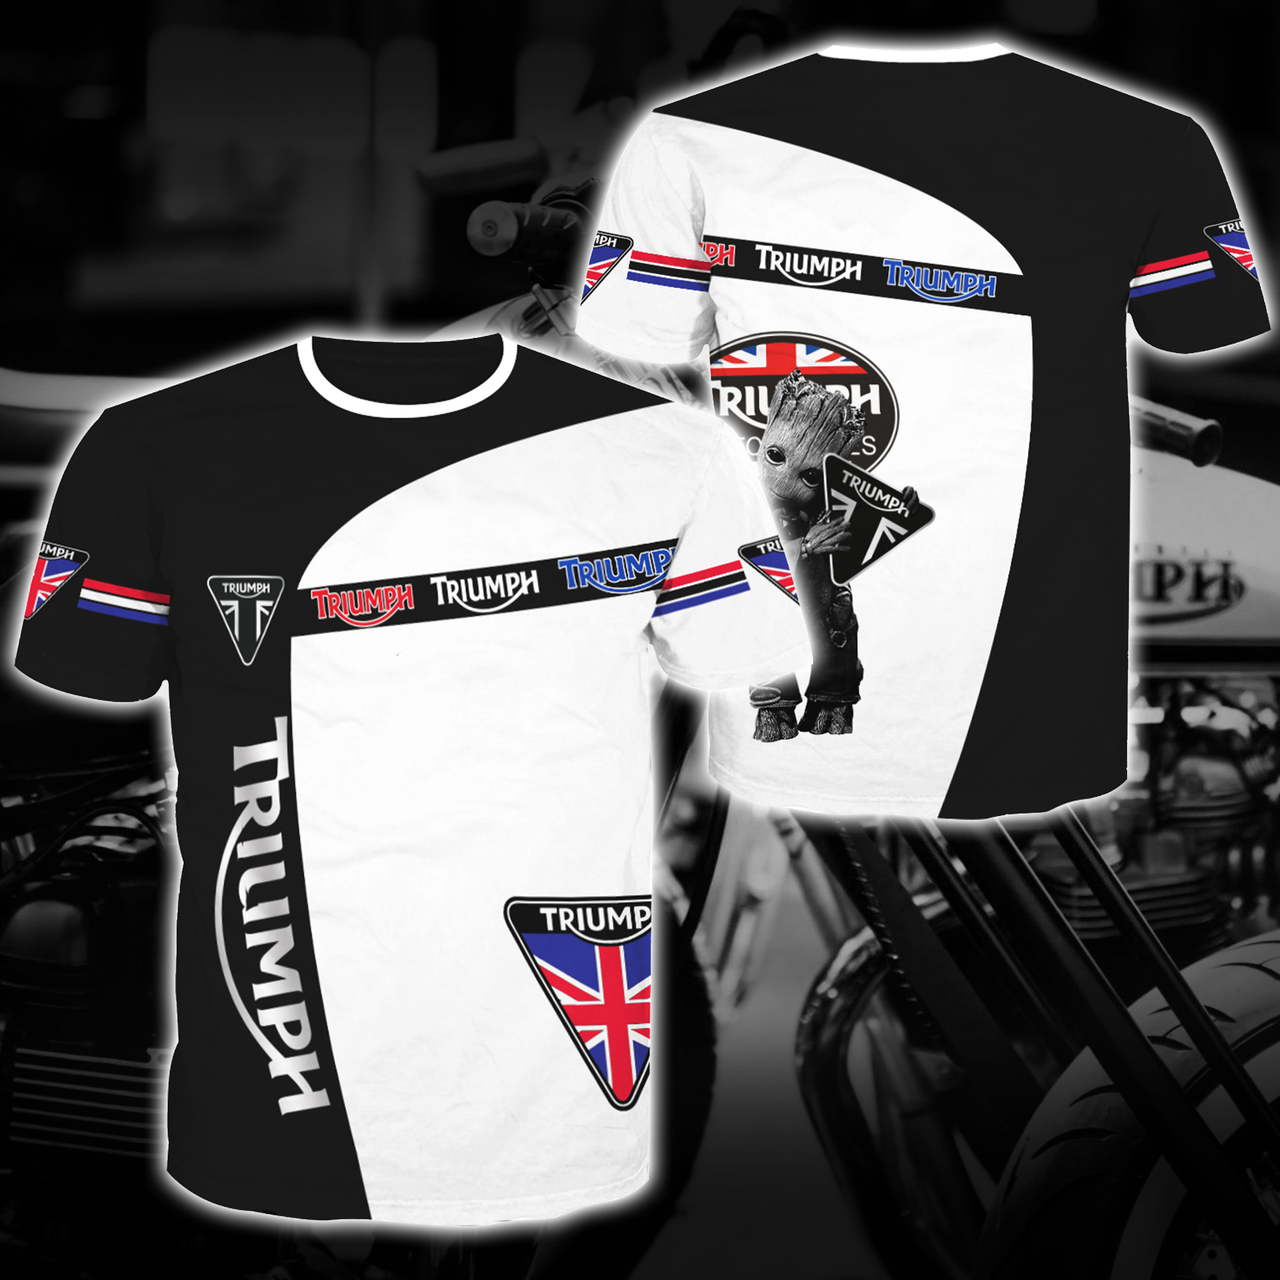 Groot triumph motor logo full printing tshirt